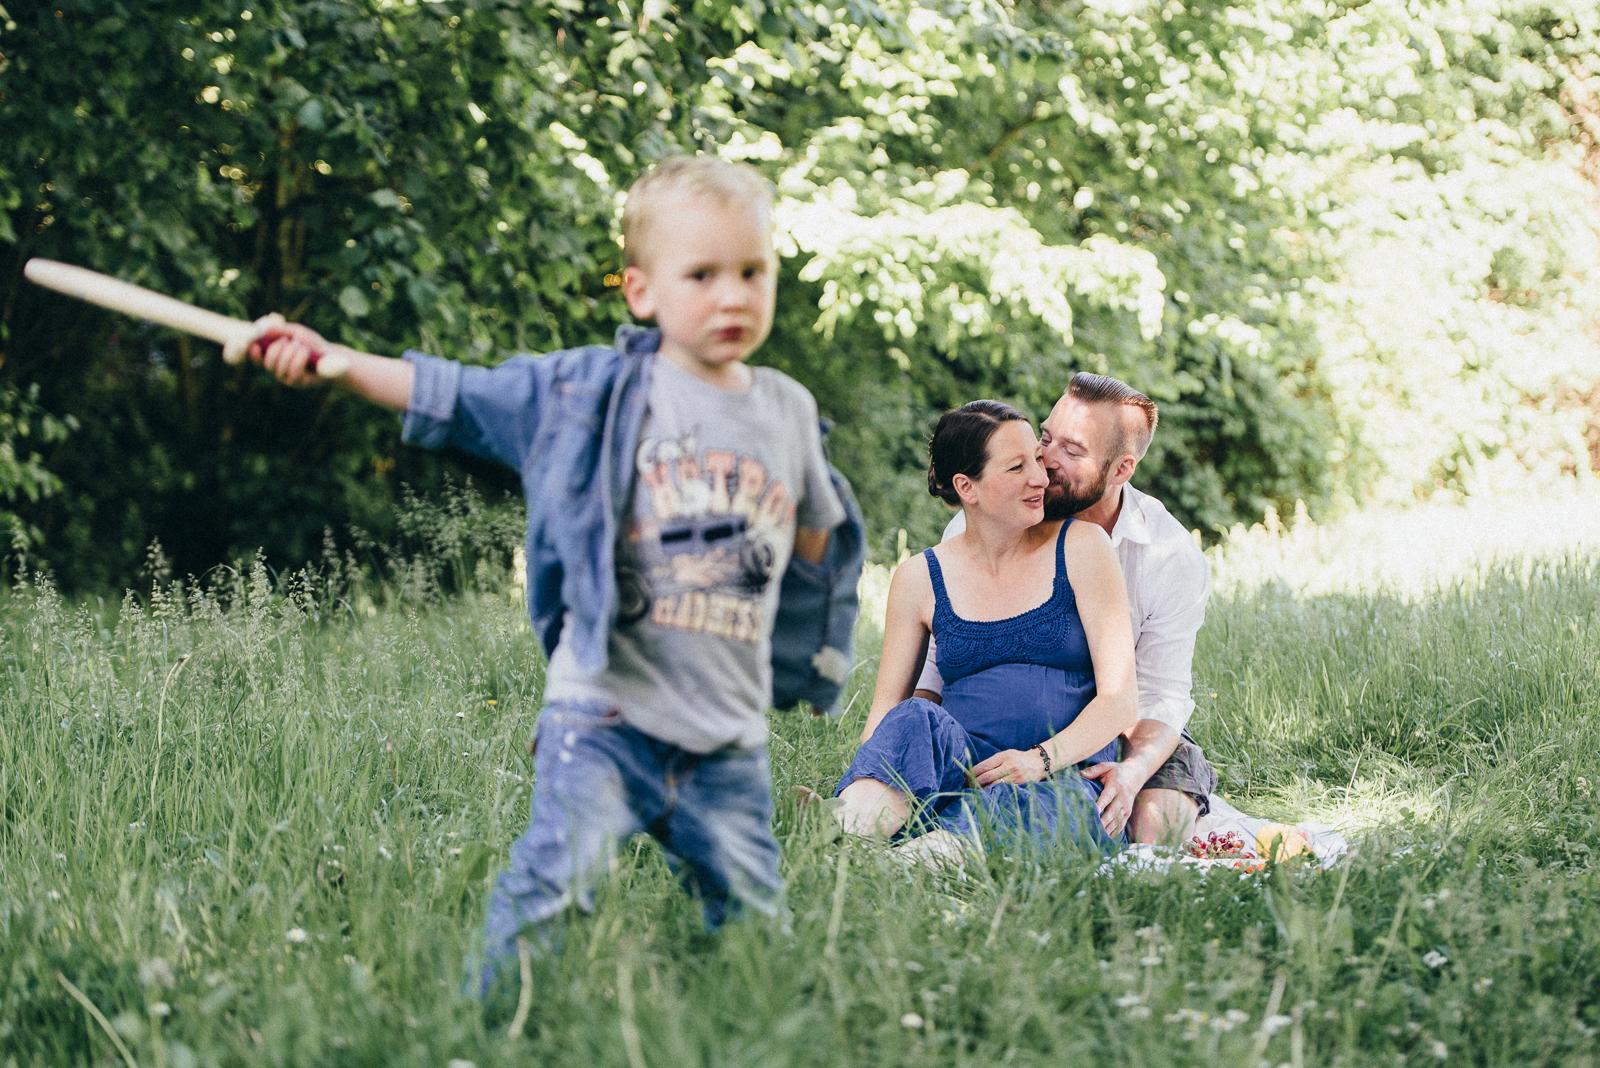 010-designparaplus-familie-fotografie-essen-familienshooting